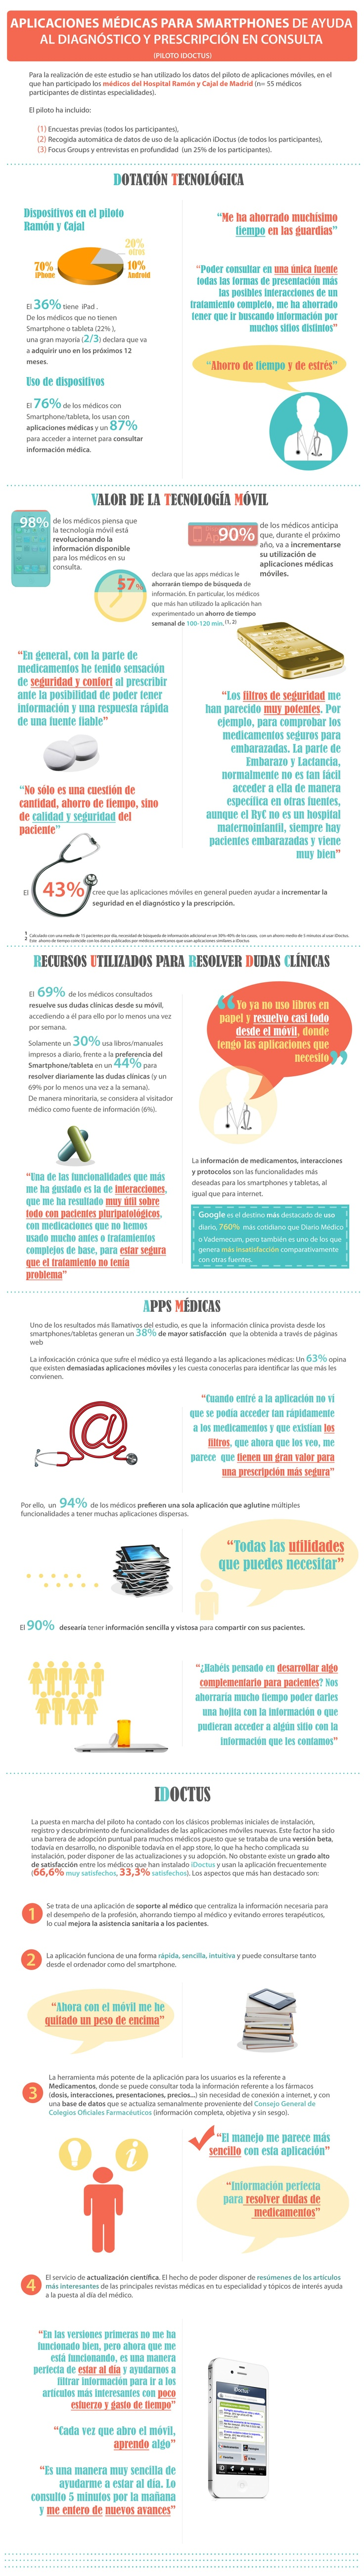 Jw.org Estudio Del Libro De Esta Semana + My PDF ...